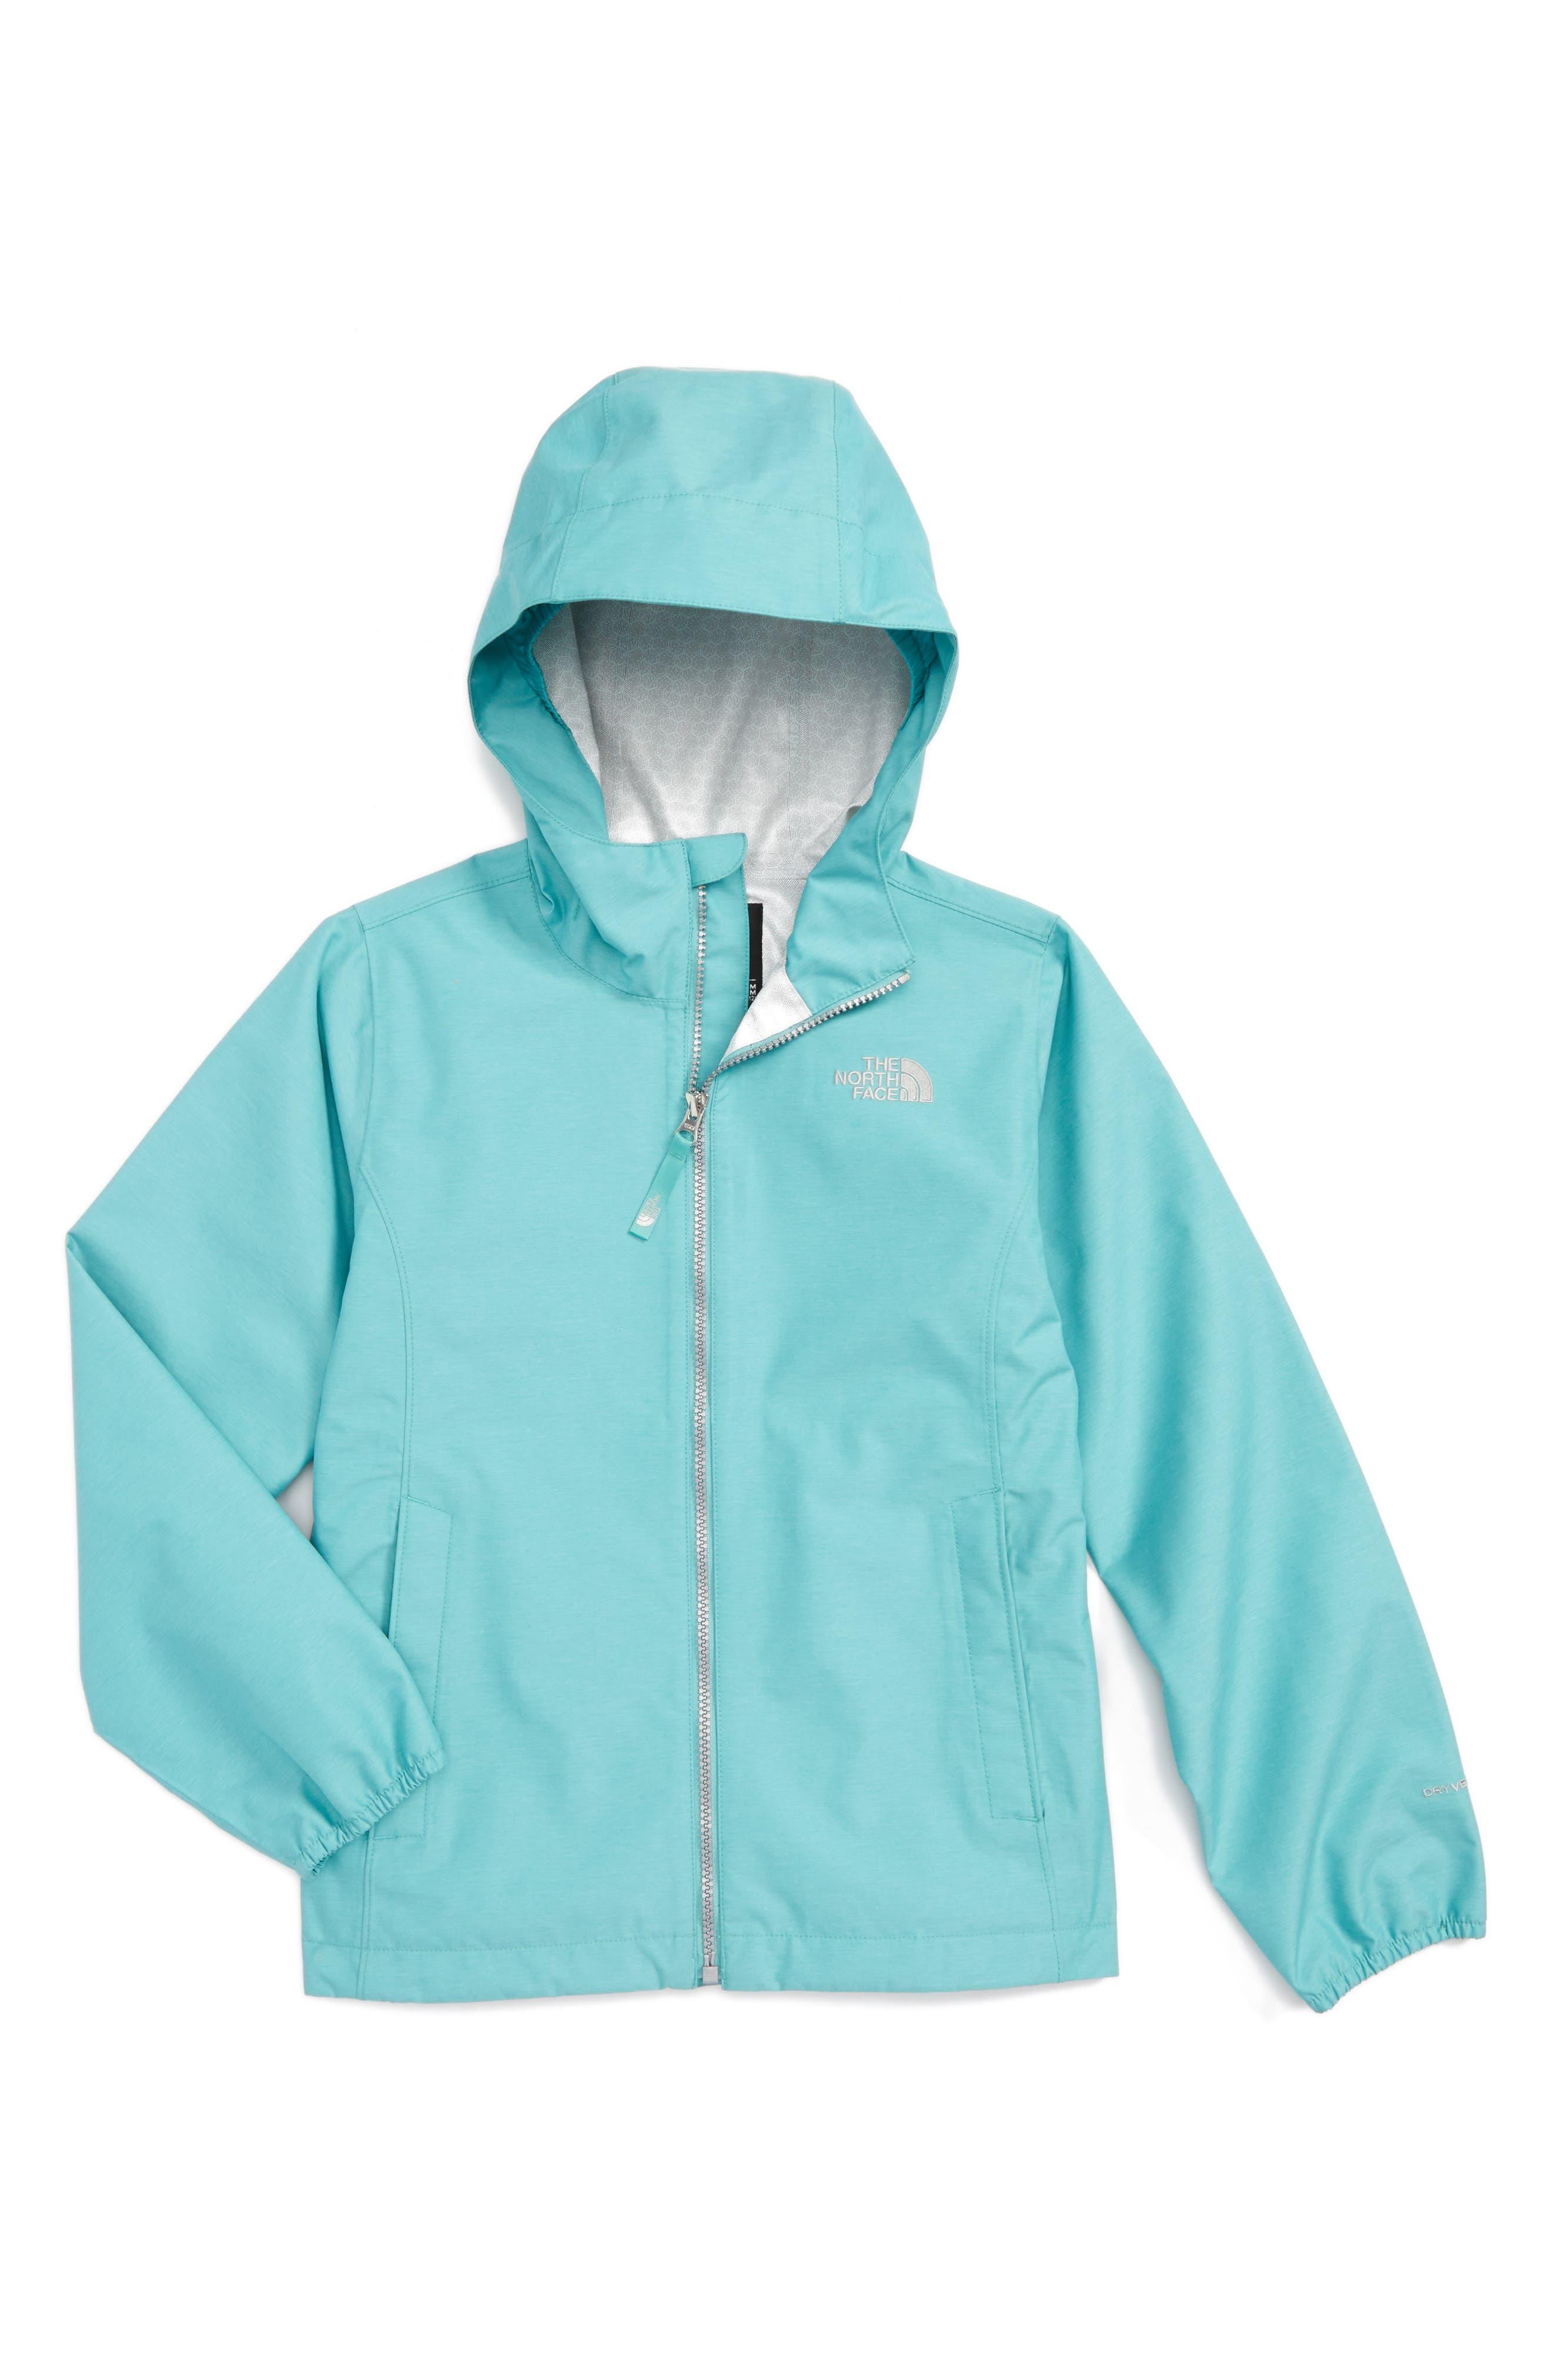 Magnolia Waterproof HyVent<sup>®</sup> Rain Jacket,                         Main,                         color, Agate Green Heather